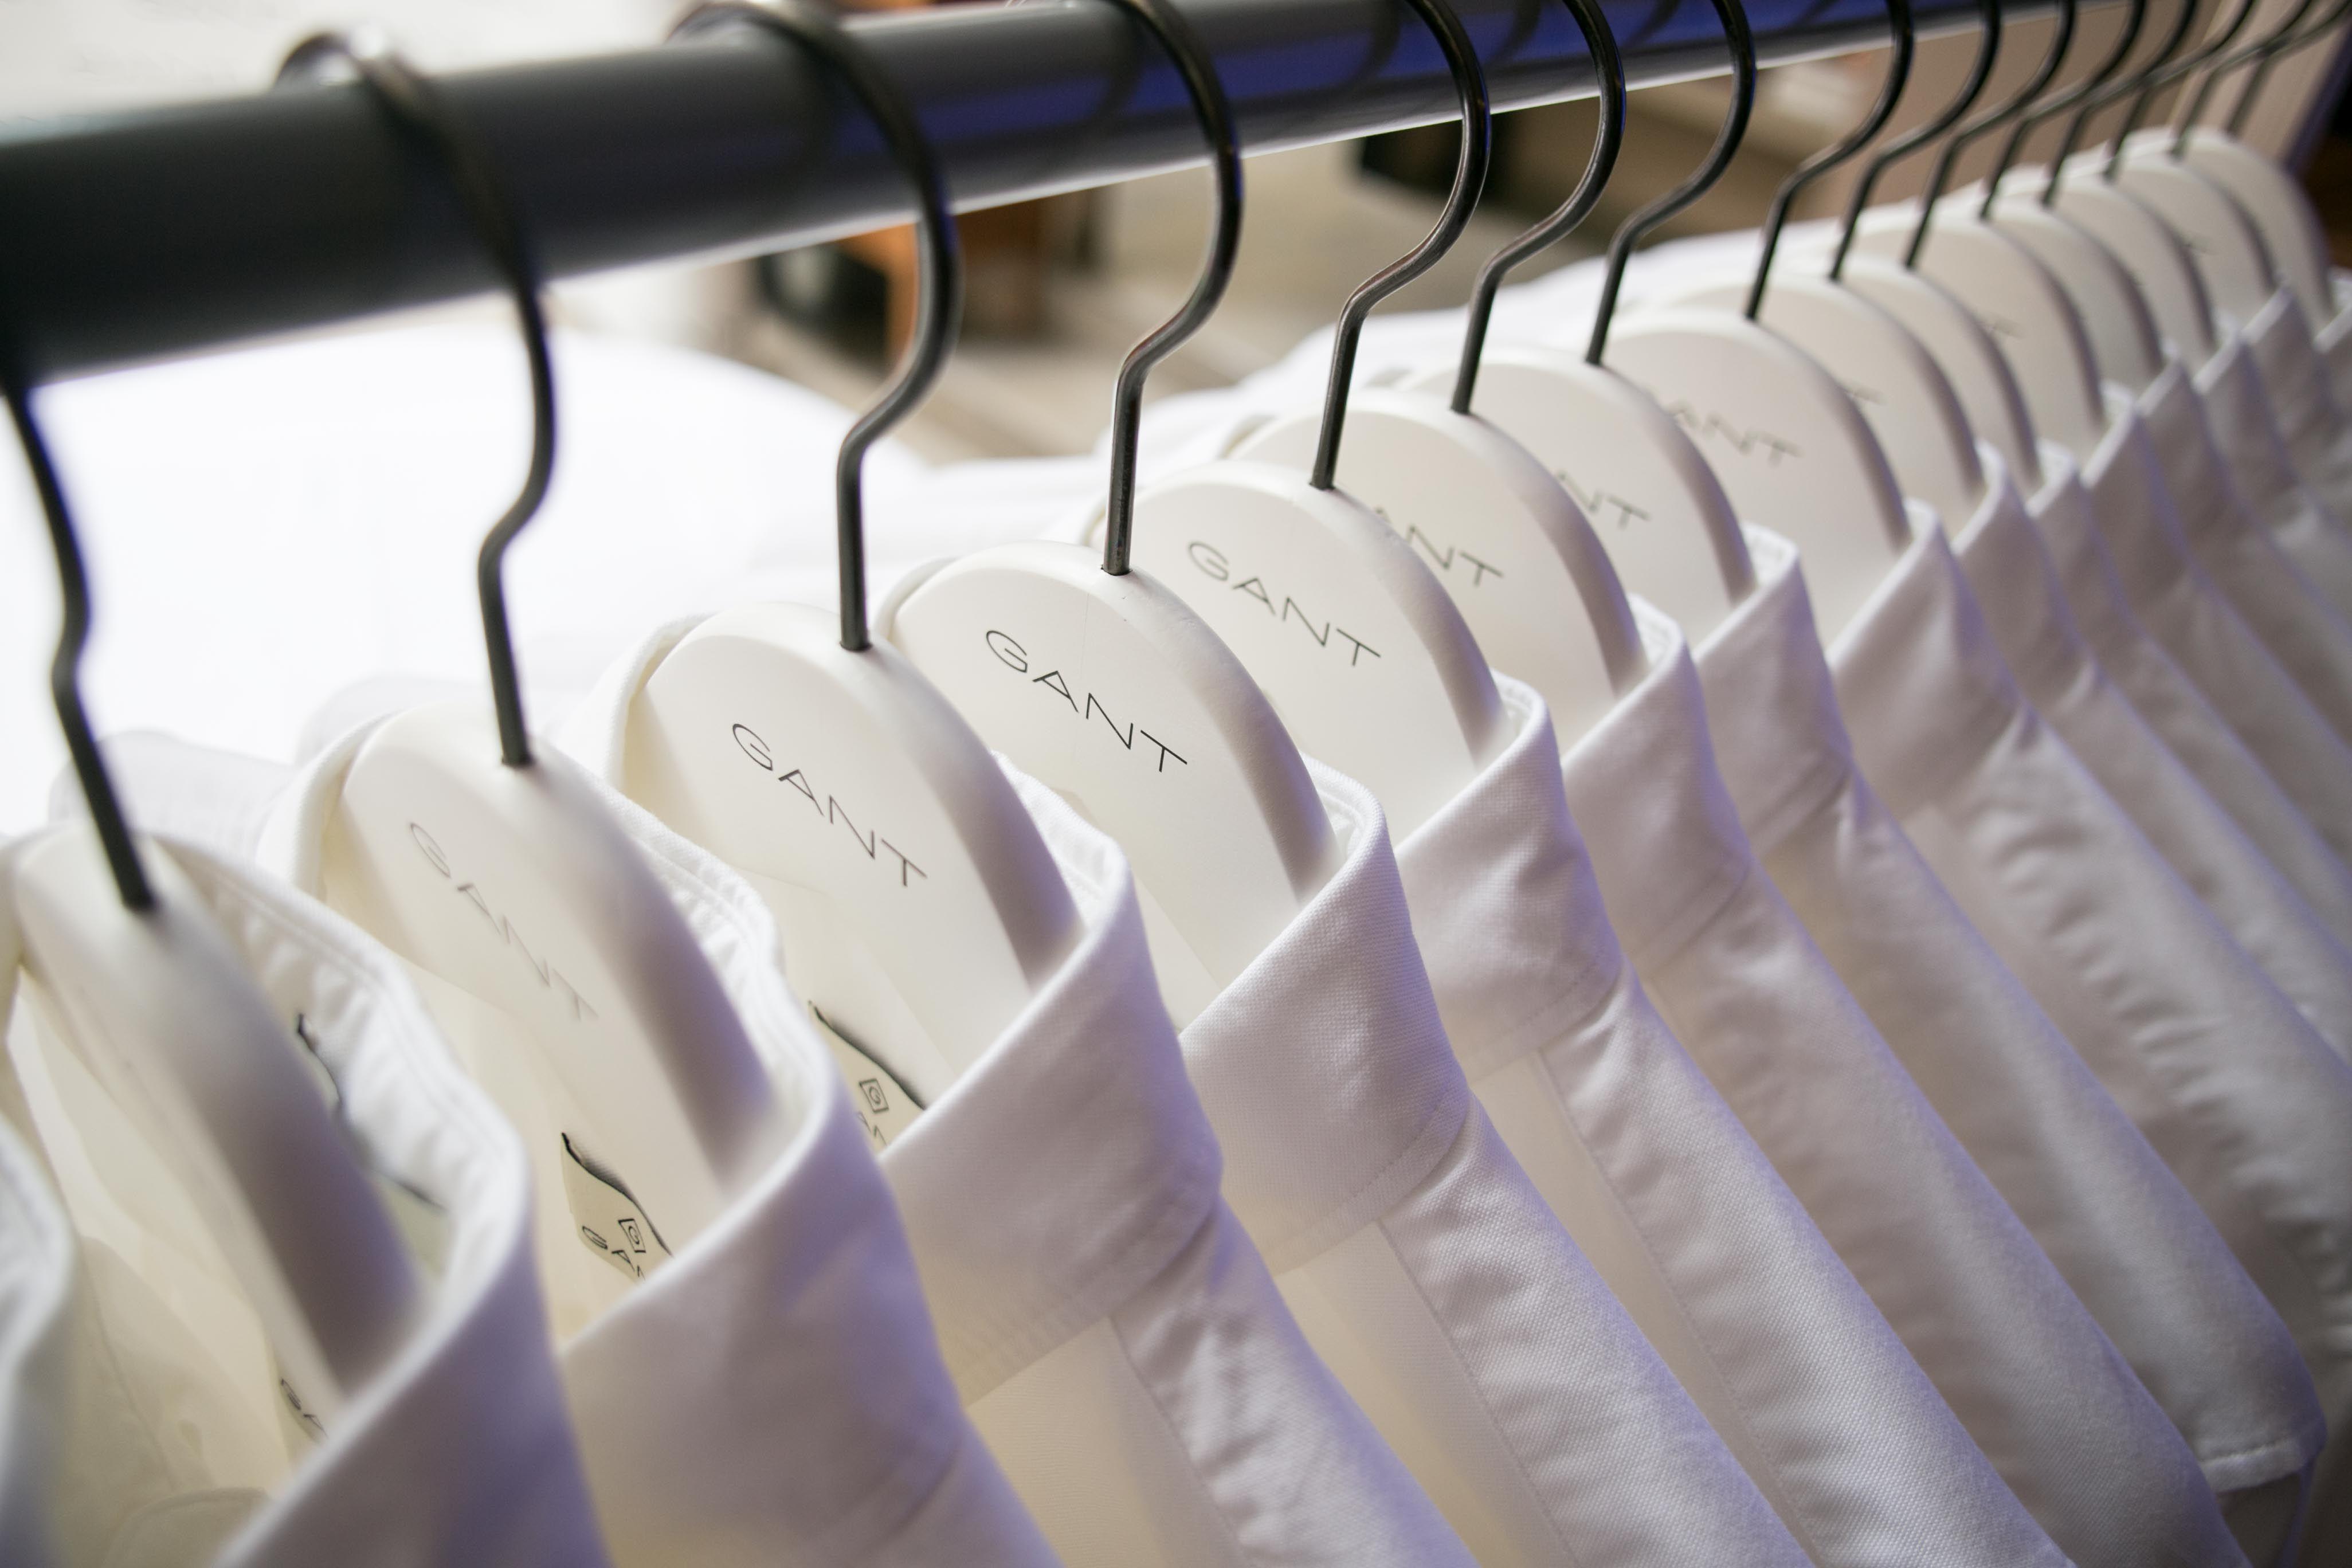 Modna marka Gant proslavila svoju novu kampanju